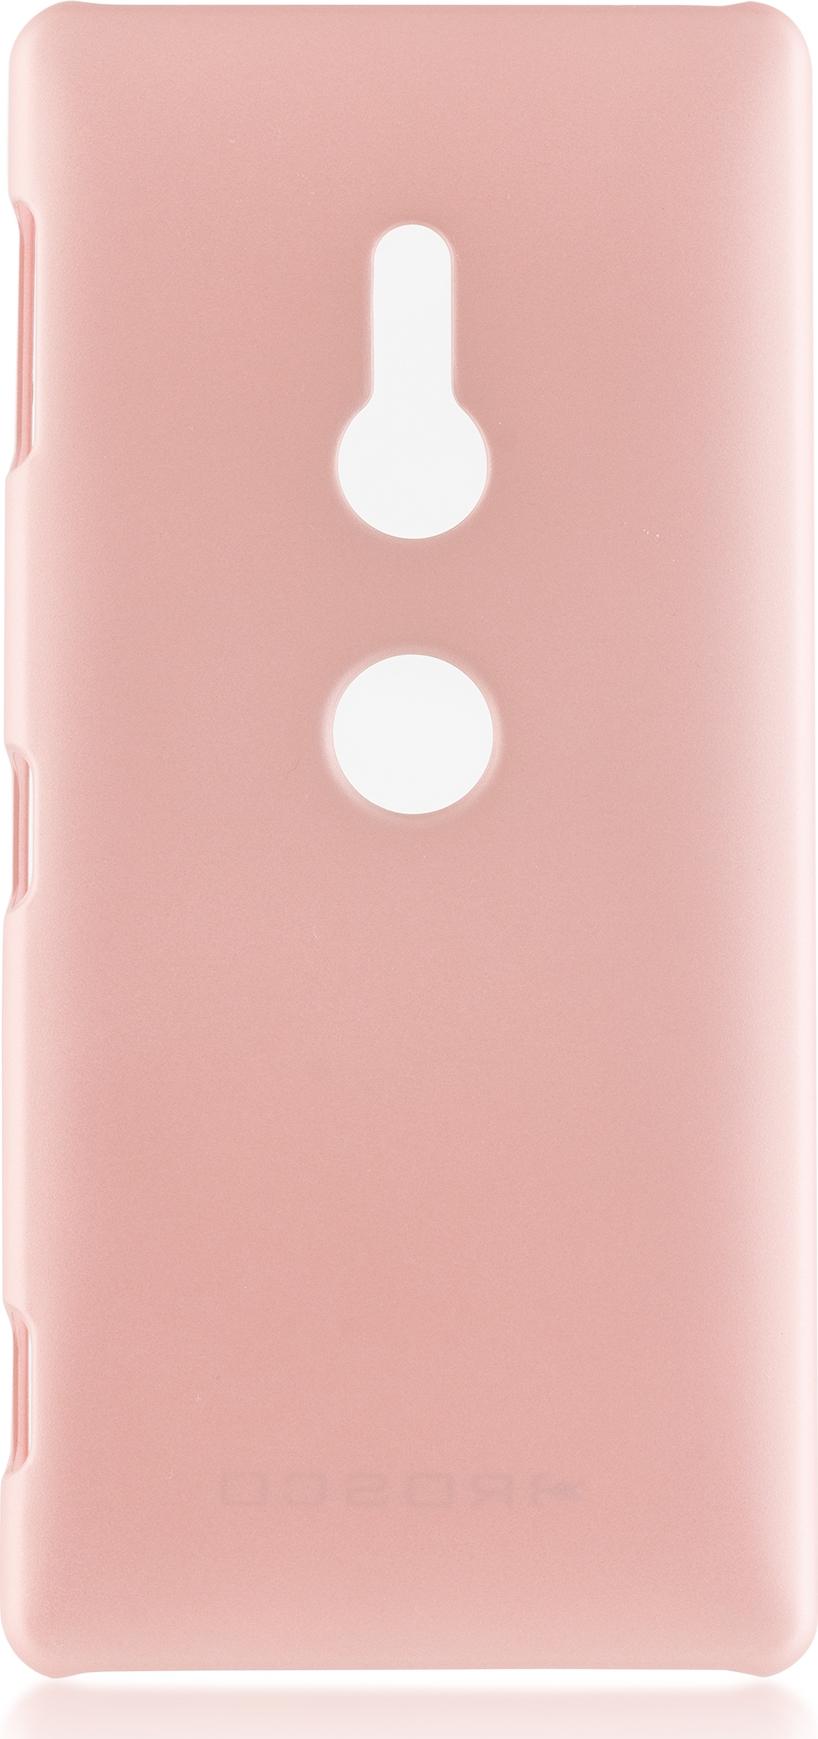 Чехол Brosco Soft-Touch для Sony Xperia XZ2, розовый цена